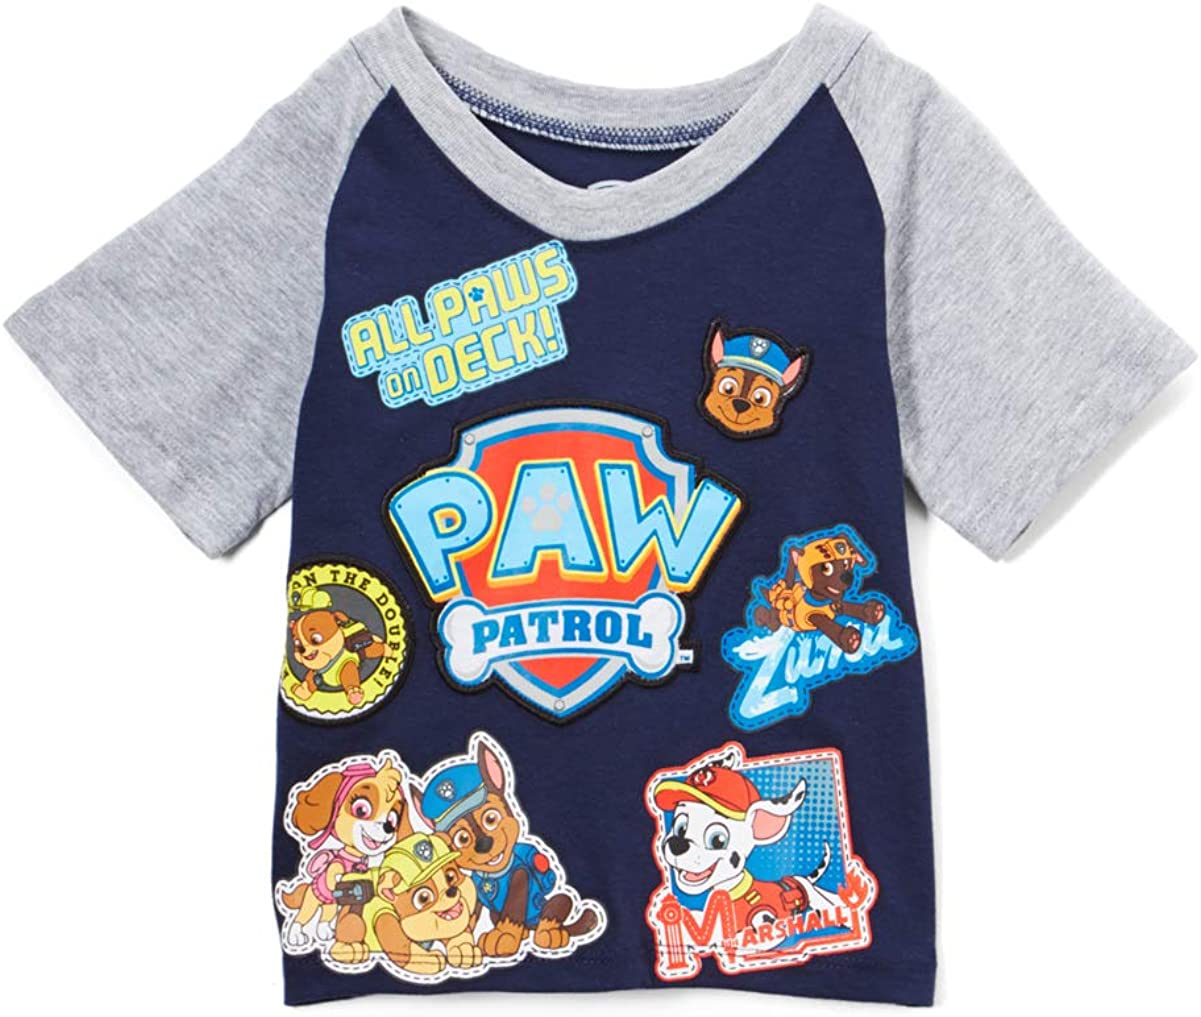 Paw Patrol Boys' Group Short Sleeve T-Shirt